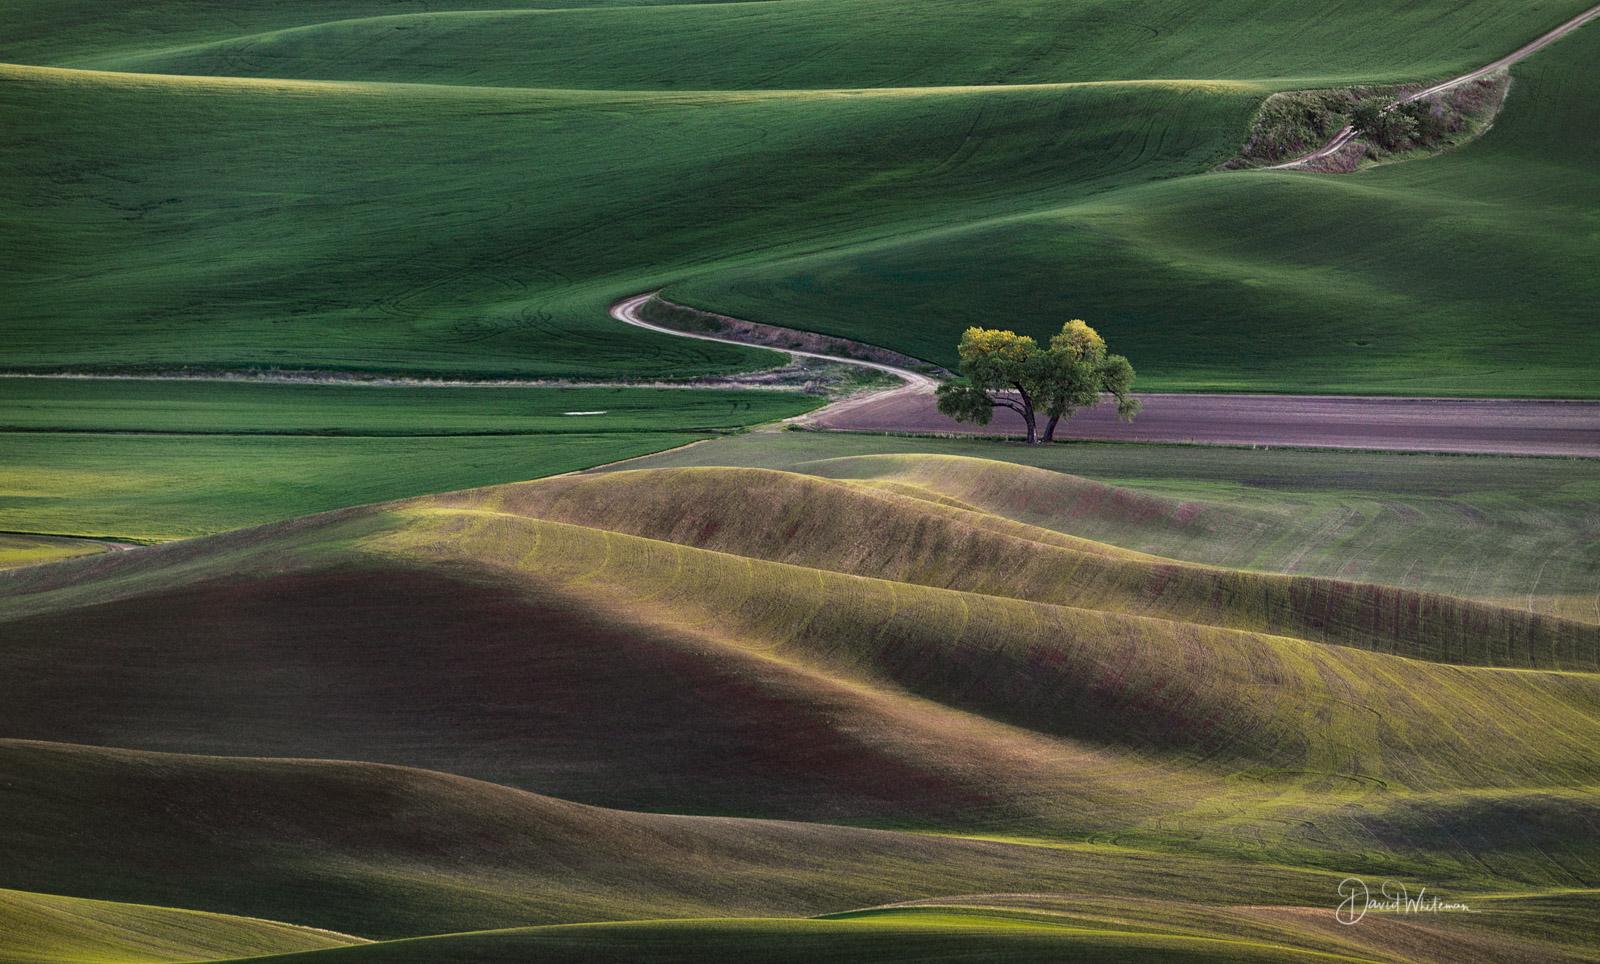 New Fields Of Wheat